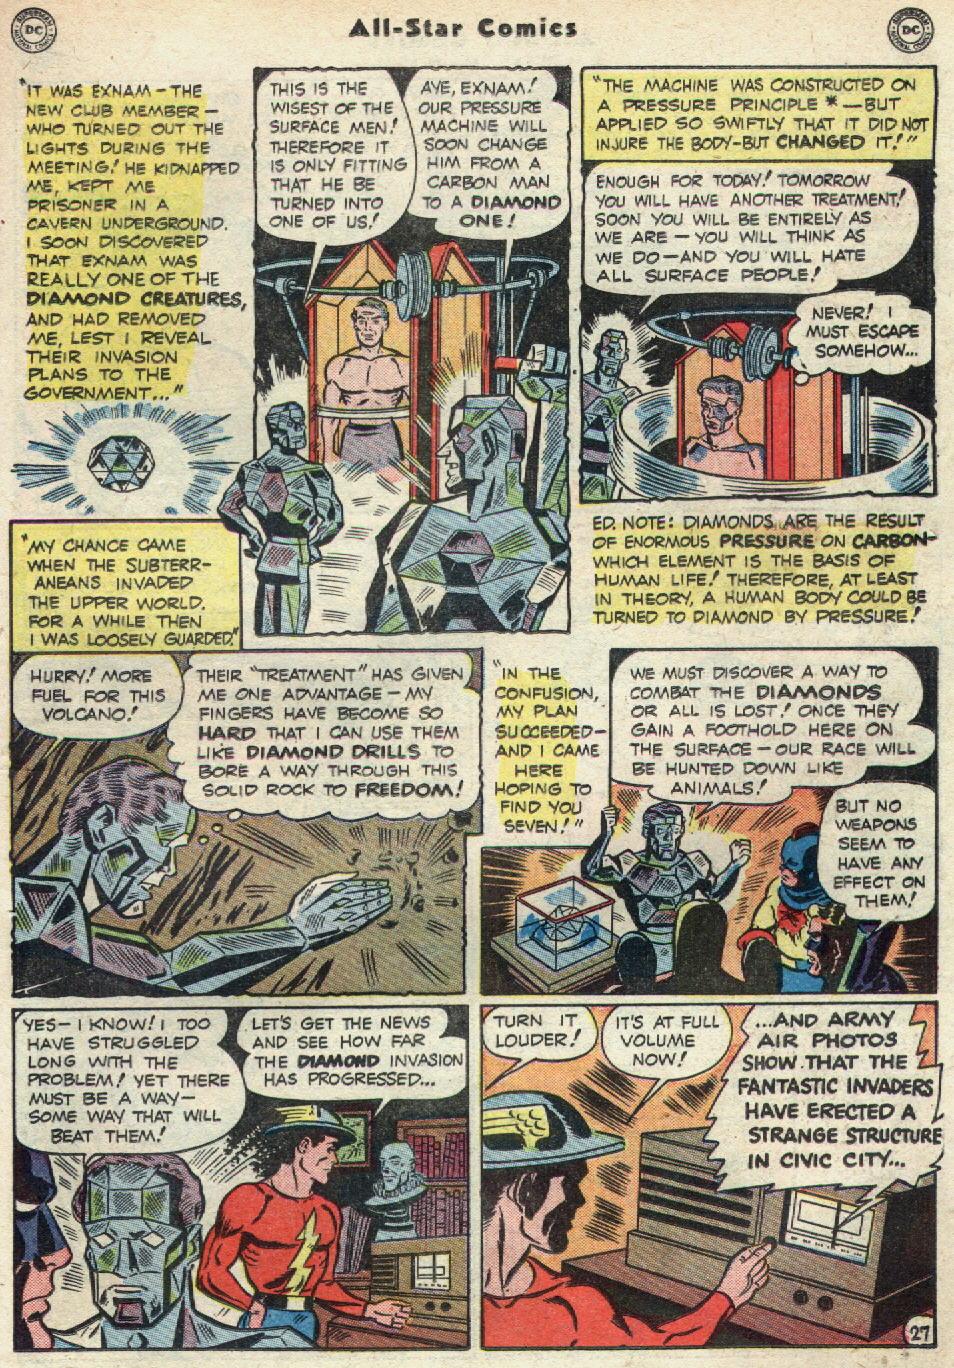 Read online All-Star Comics comic -  Issue #51 - 33